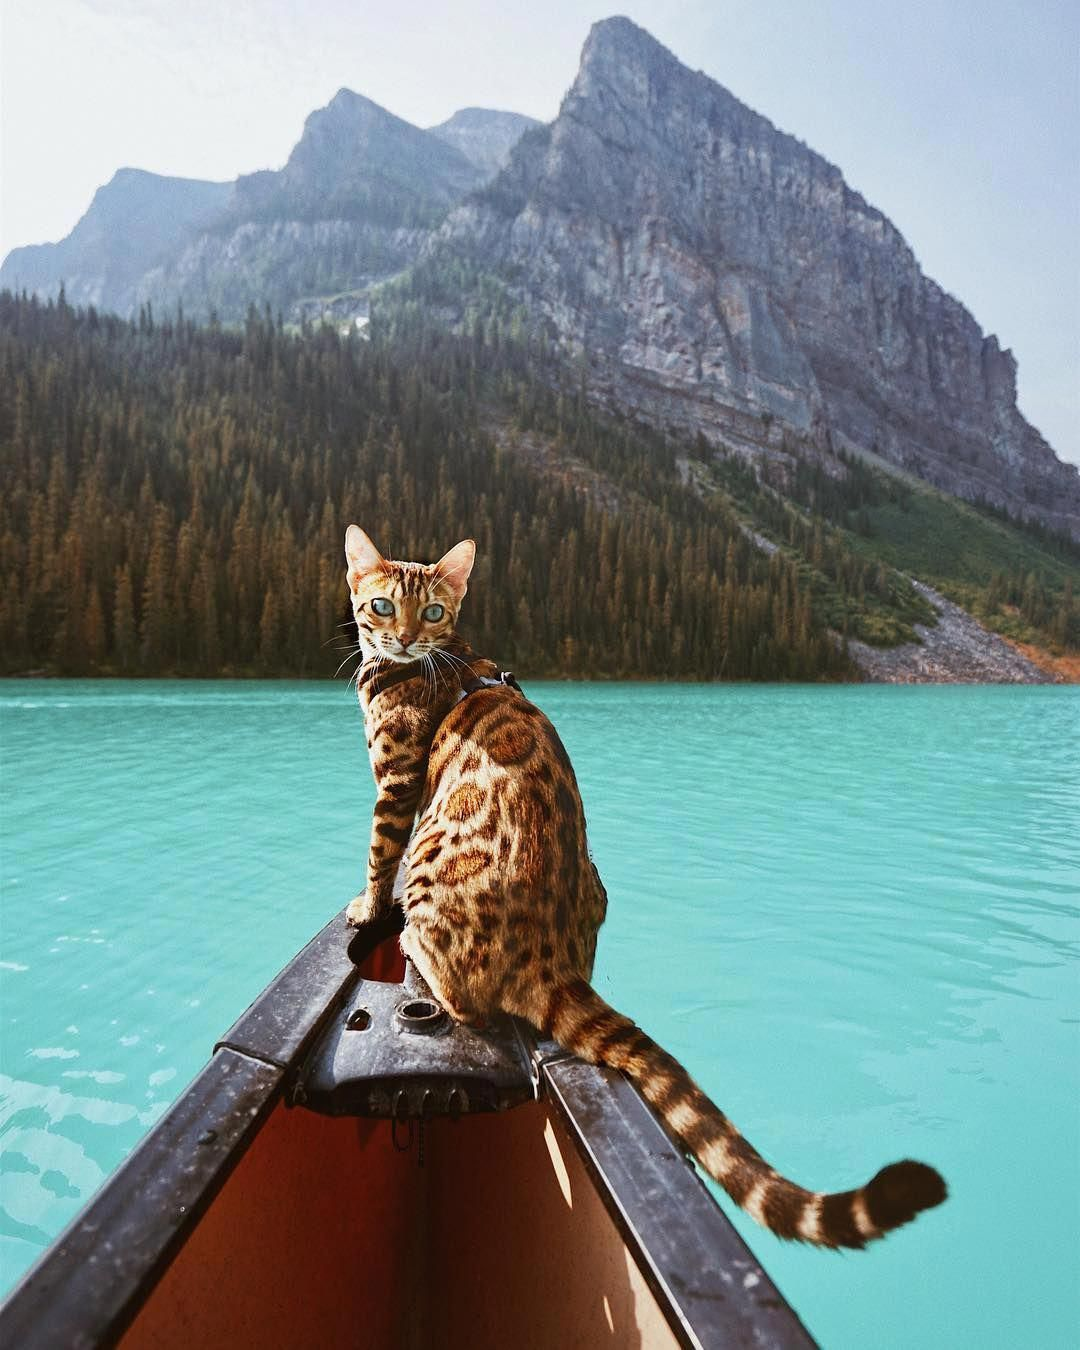 Cats Craigslist Catsyellow Beautiful Cats Pictures Bengal Cat Adventure Cat